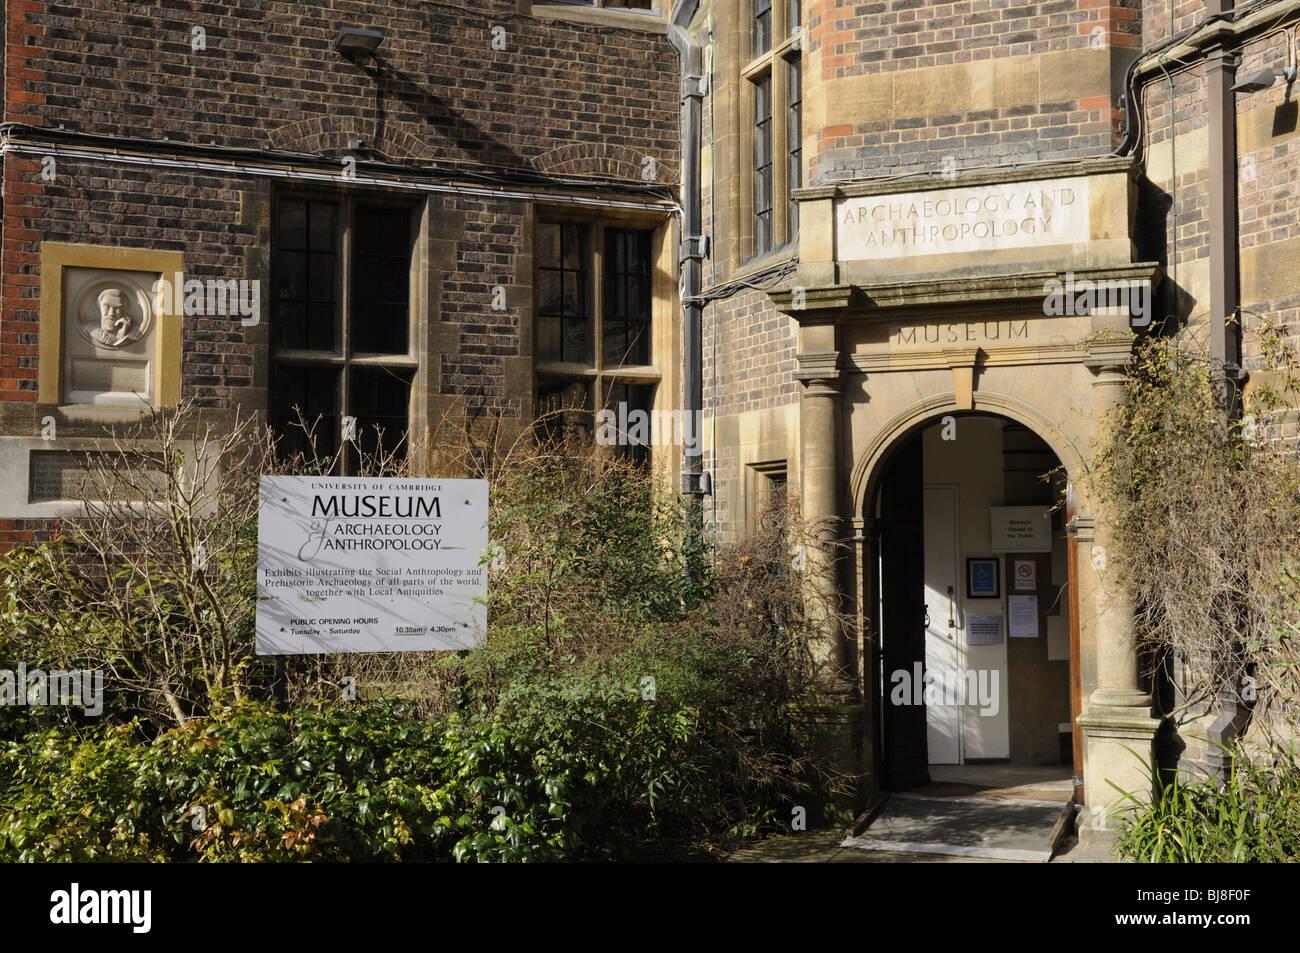 Museum of Archeology and Anthropology, Downing street, Cambridge, England UK - Stock Image